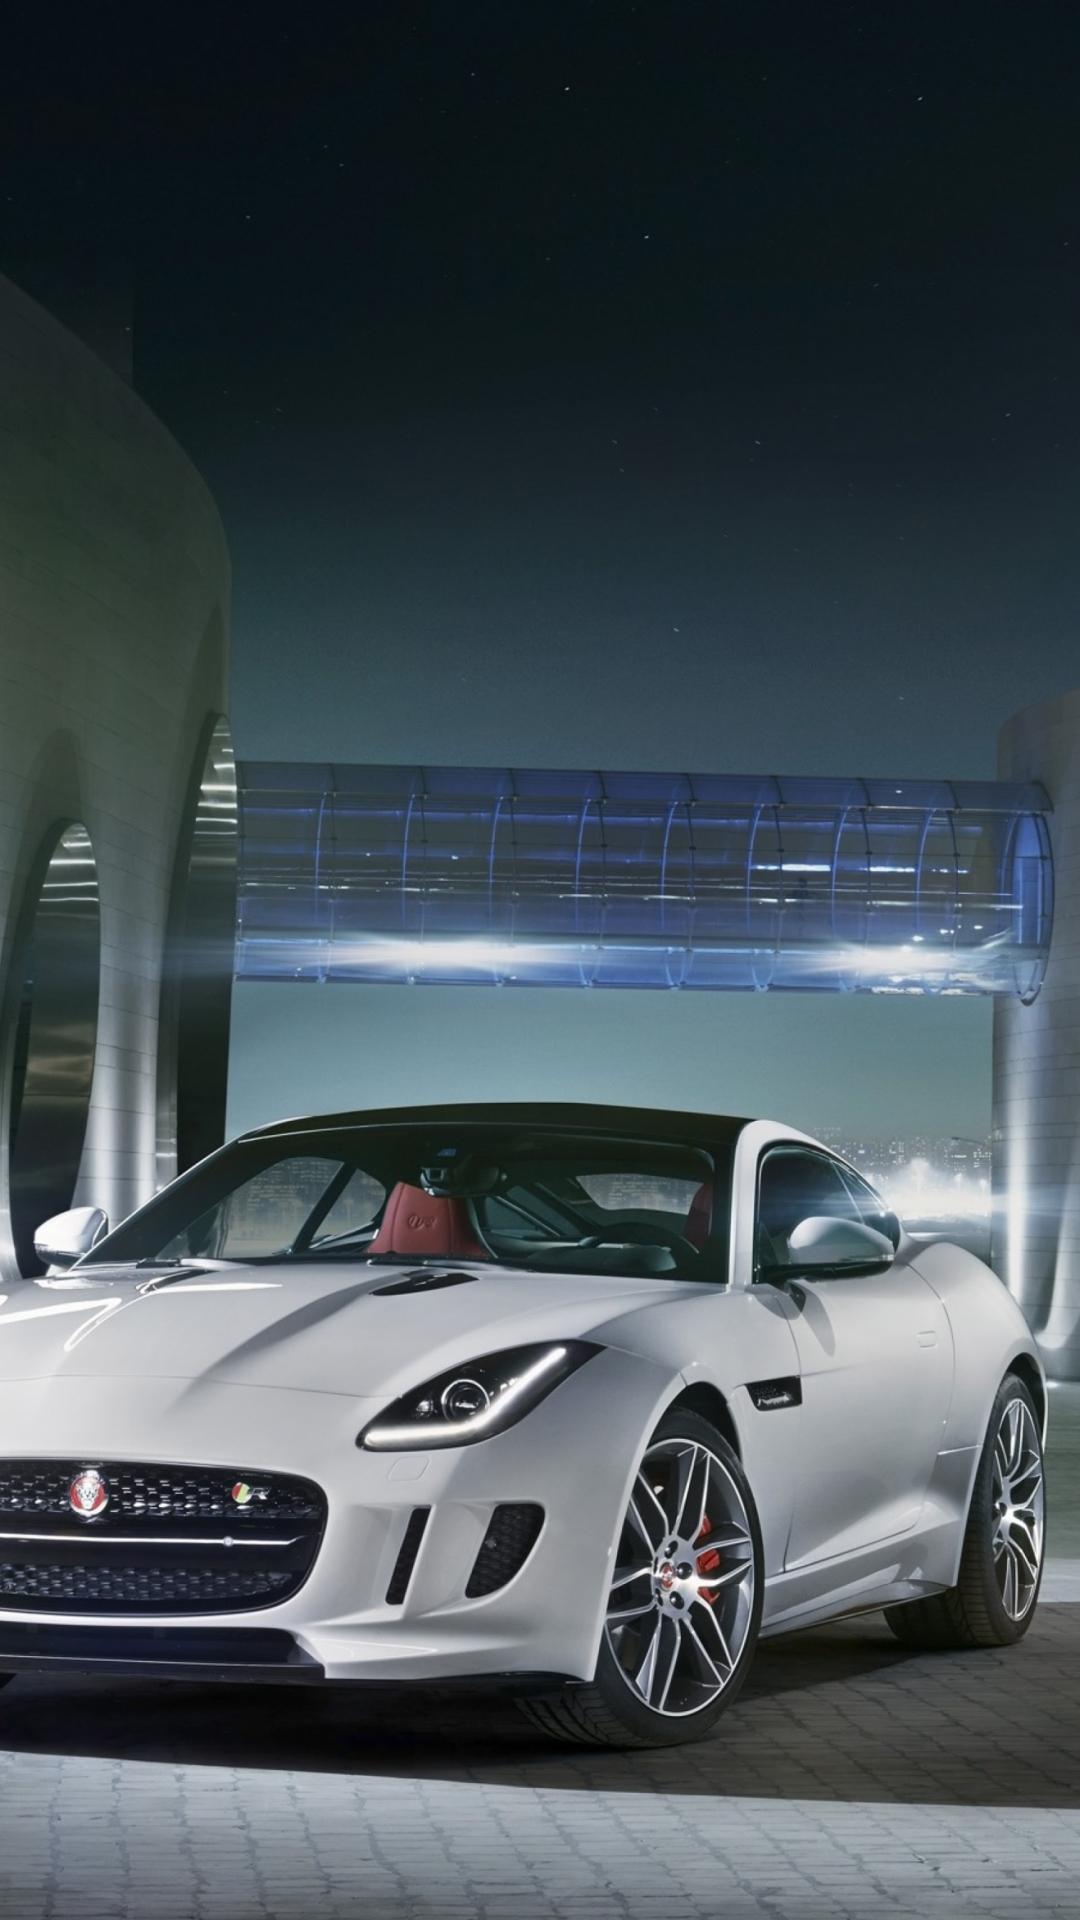 Jaguar F Type R Coupe 21 Wallpaper for iPhone 21 Plus